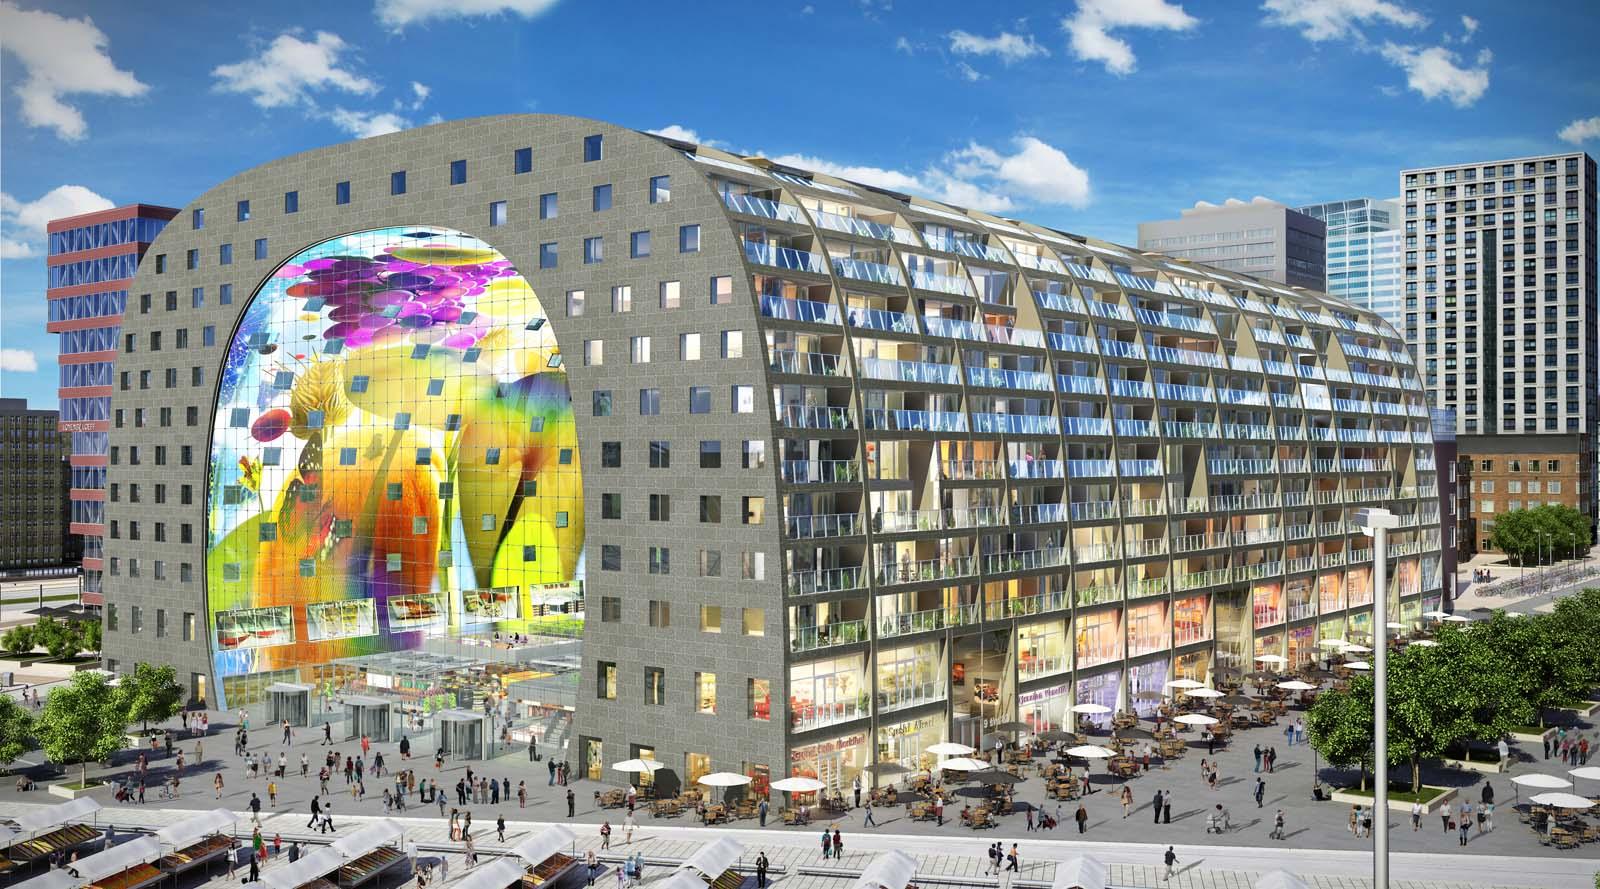 Verlengde nieuwstraat rotterdam city center zuid for Huurwoningen rotterdam ijsselmonde